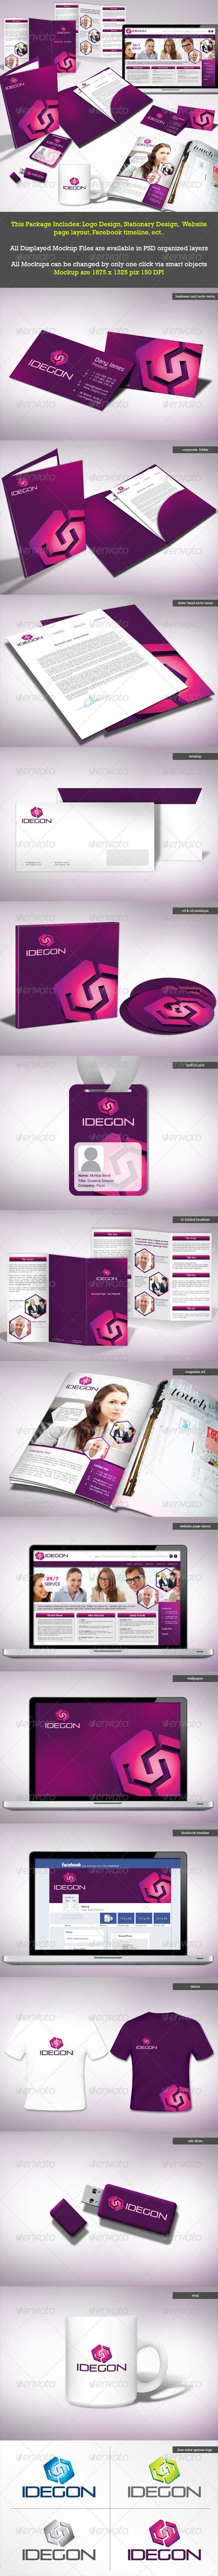 GraphicRiver Idegon Corporate Identity Package 2478292